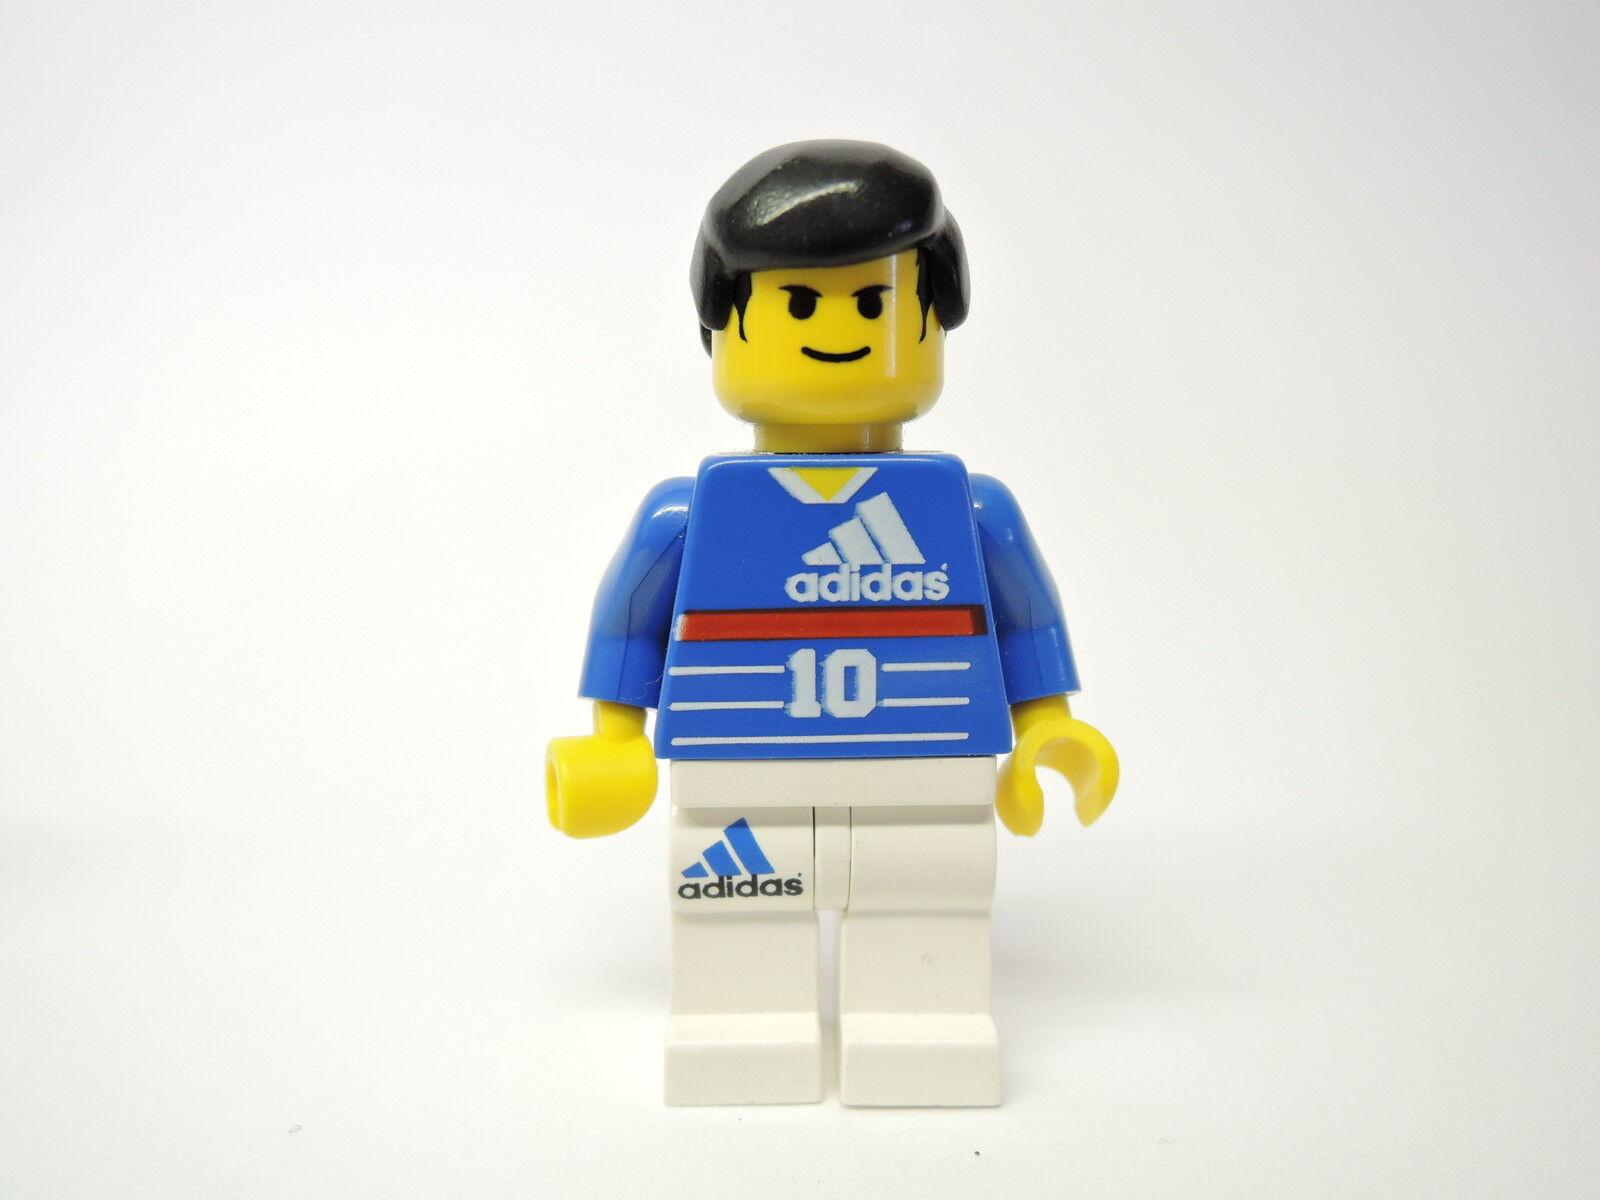 LEGO personnage sport footballeur Zinedine Zidane Zidane Zidane soc044 set 3401 | Emballage élégant Et Robuste  30791b